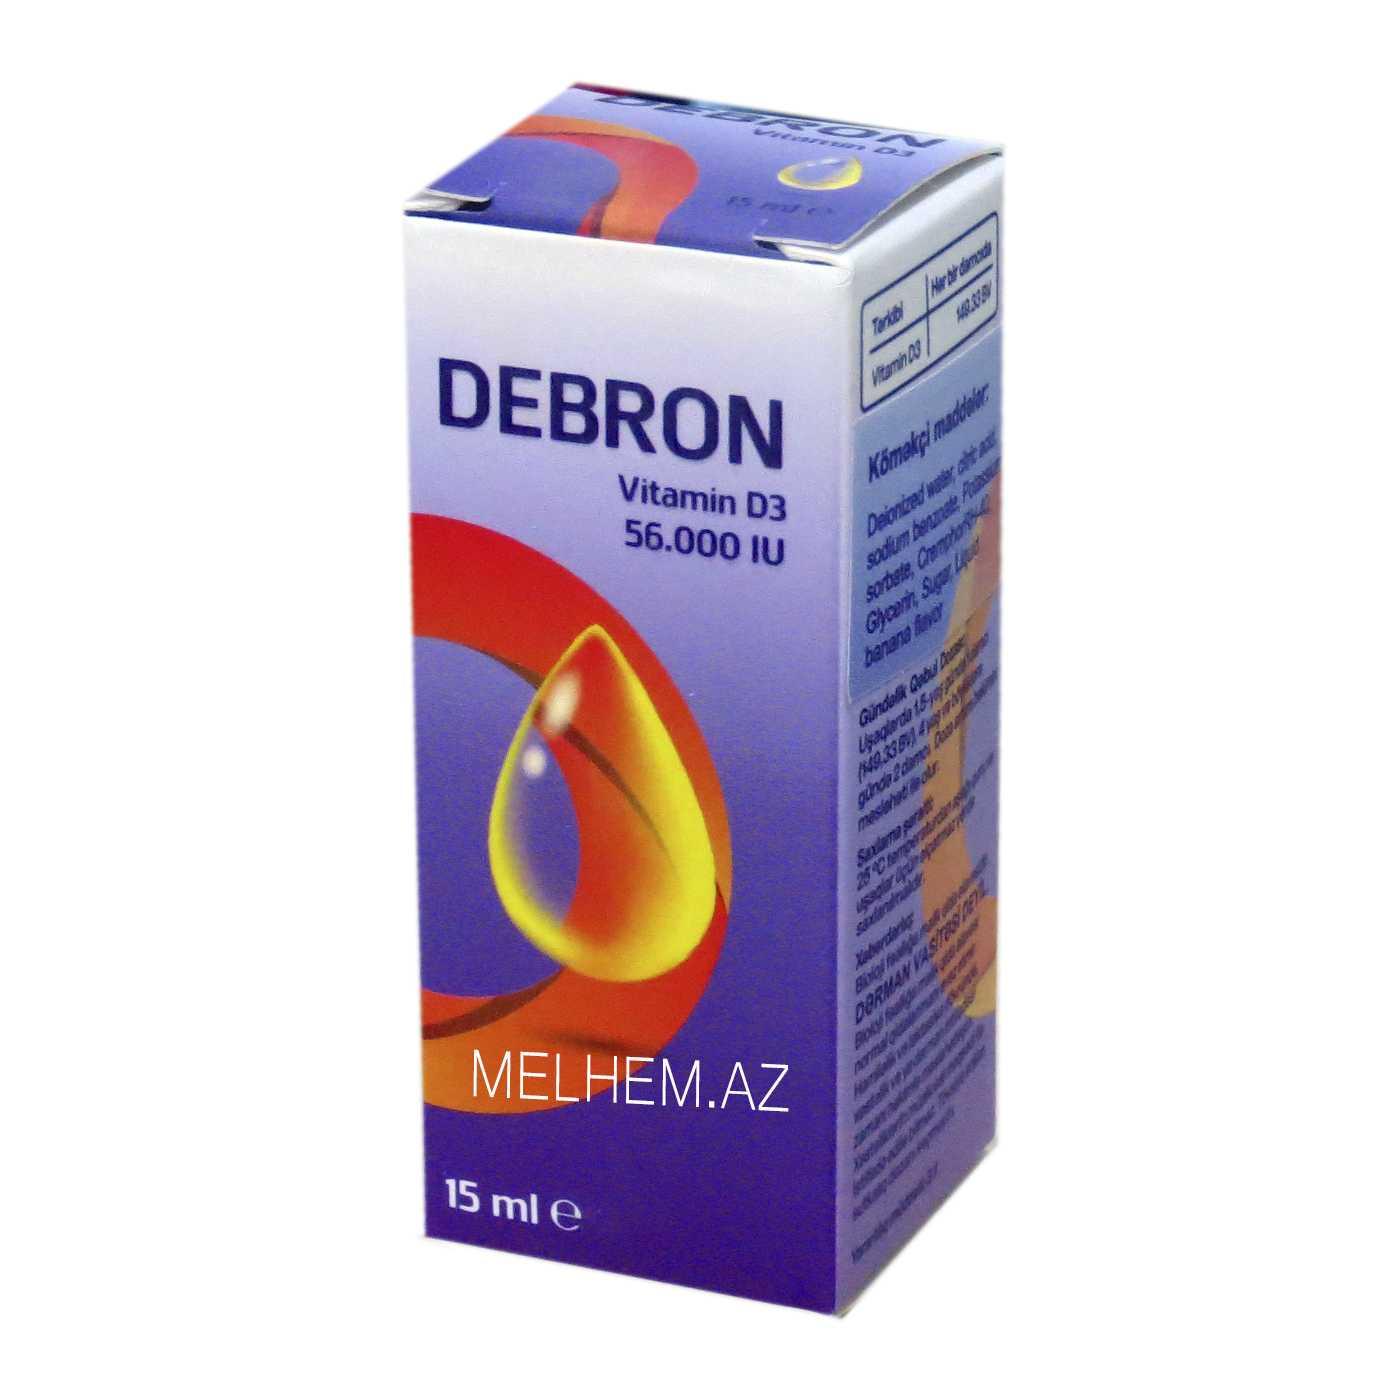 DEBRON 15ML